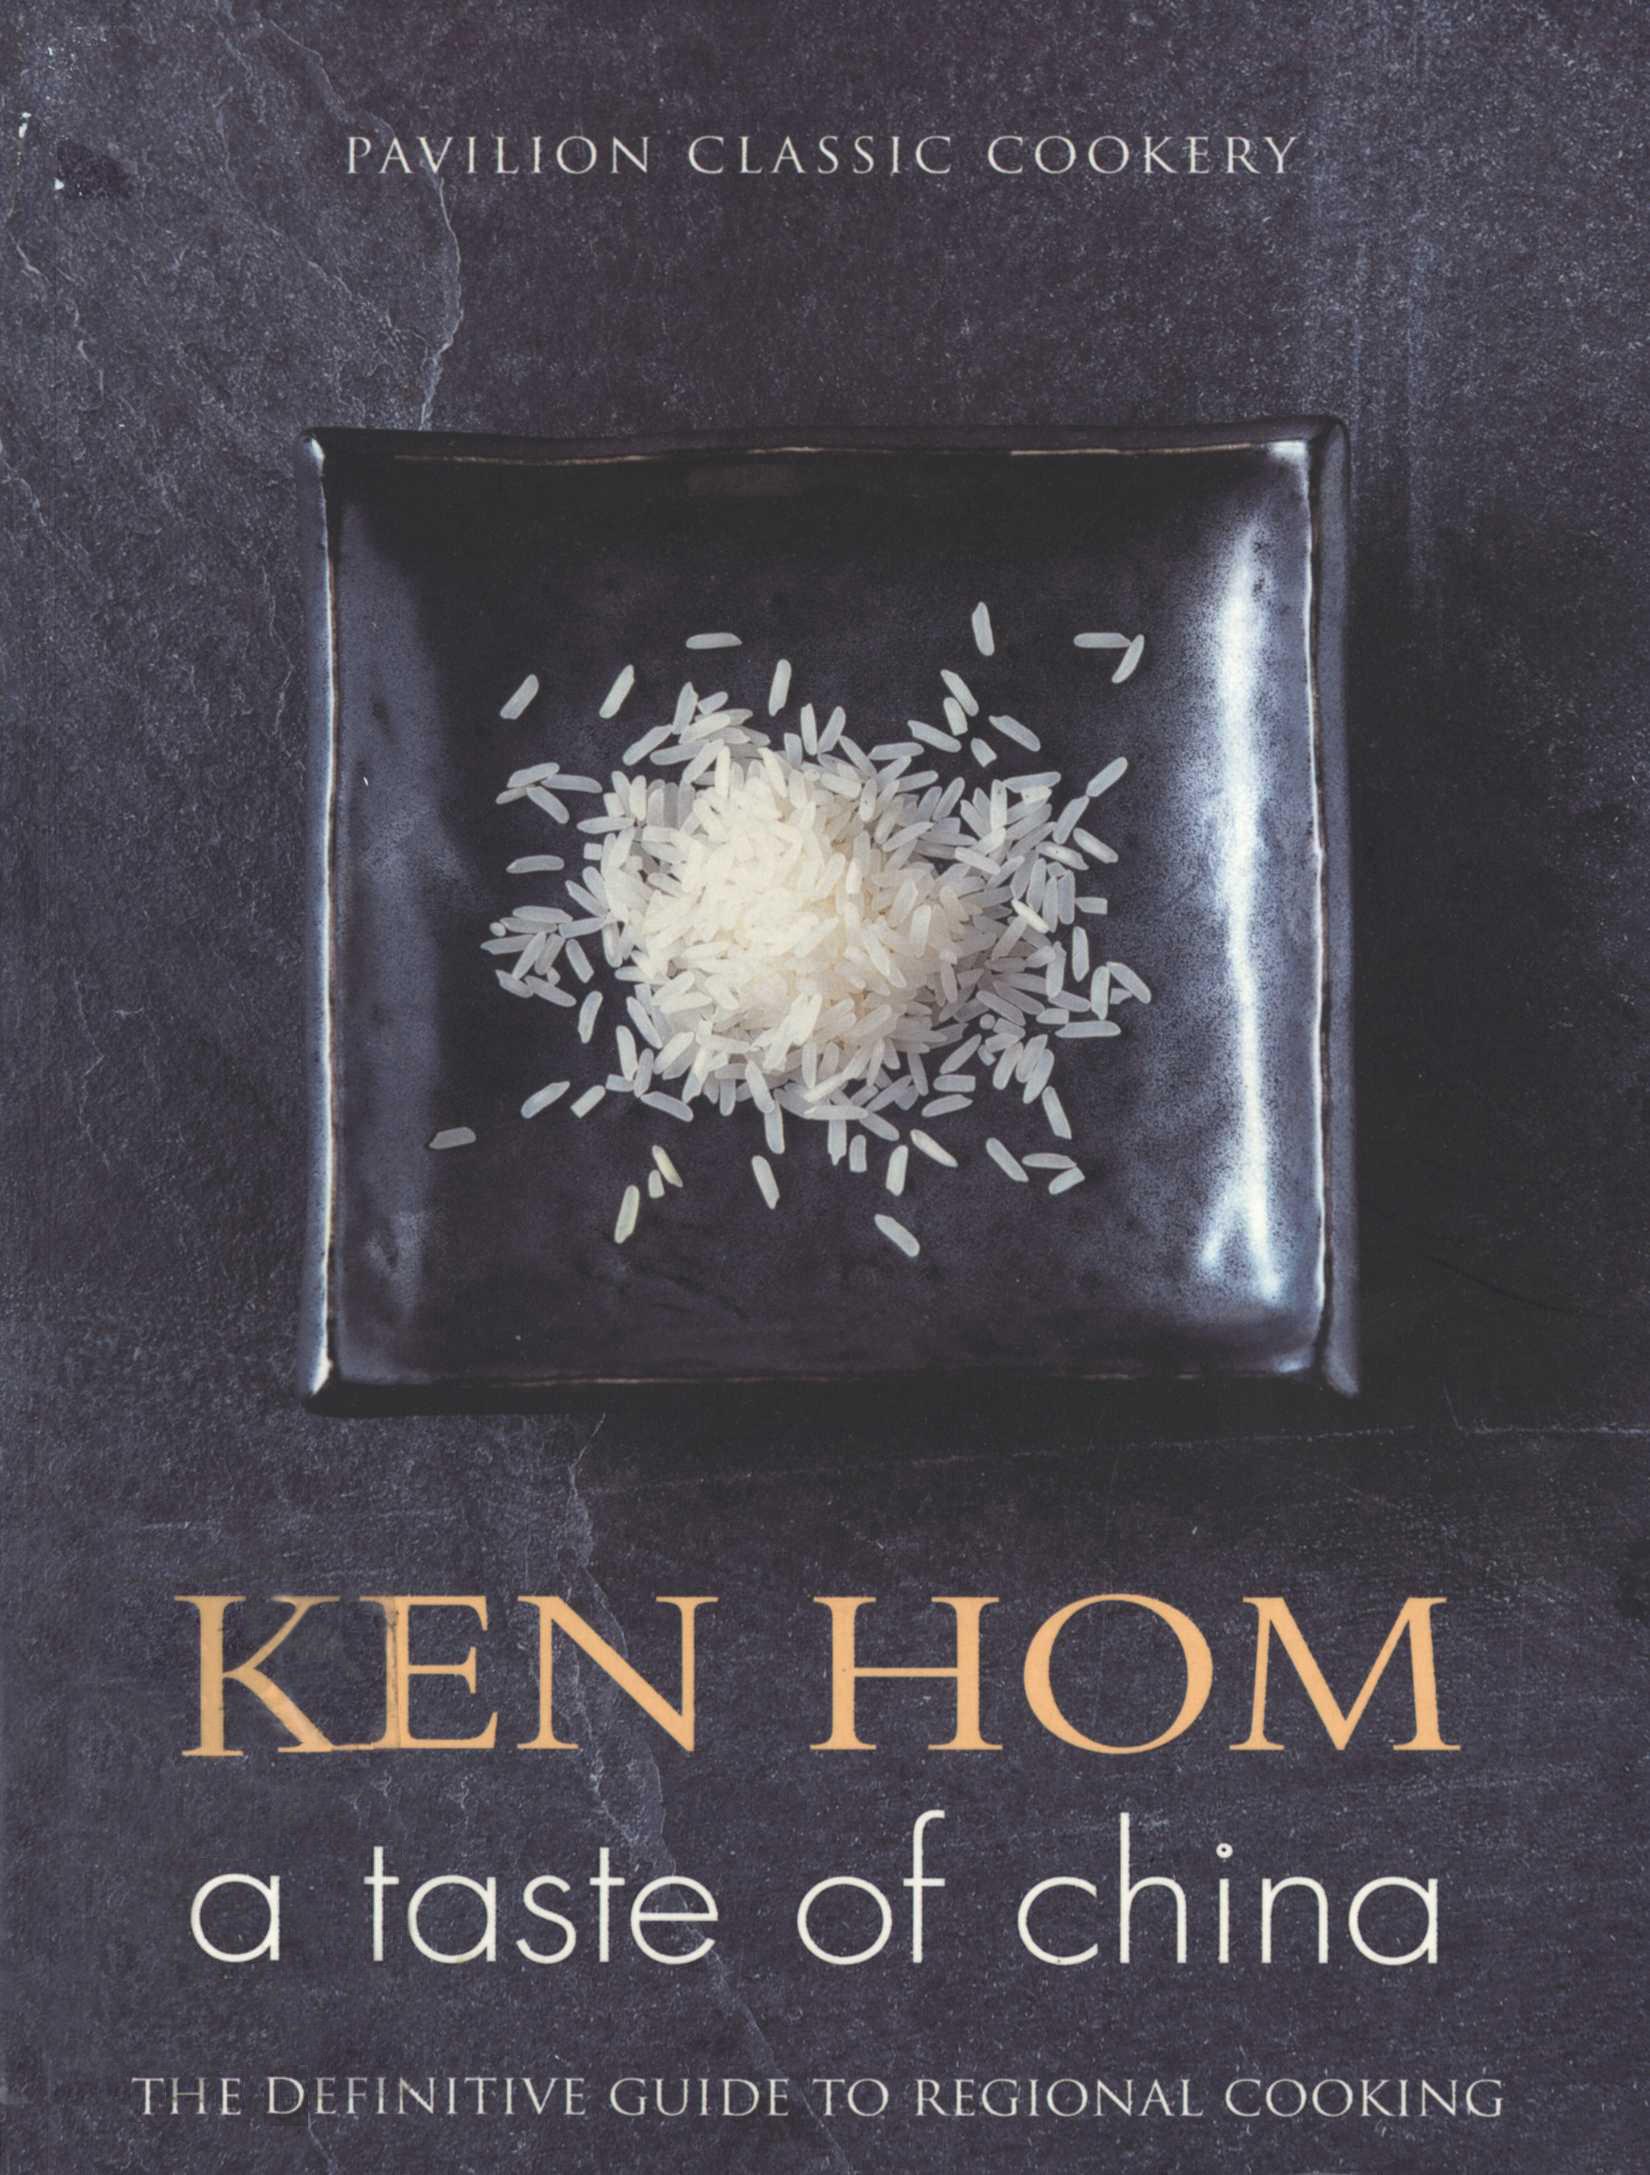 Hom - The Taste of China - 9781862057074.jpg